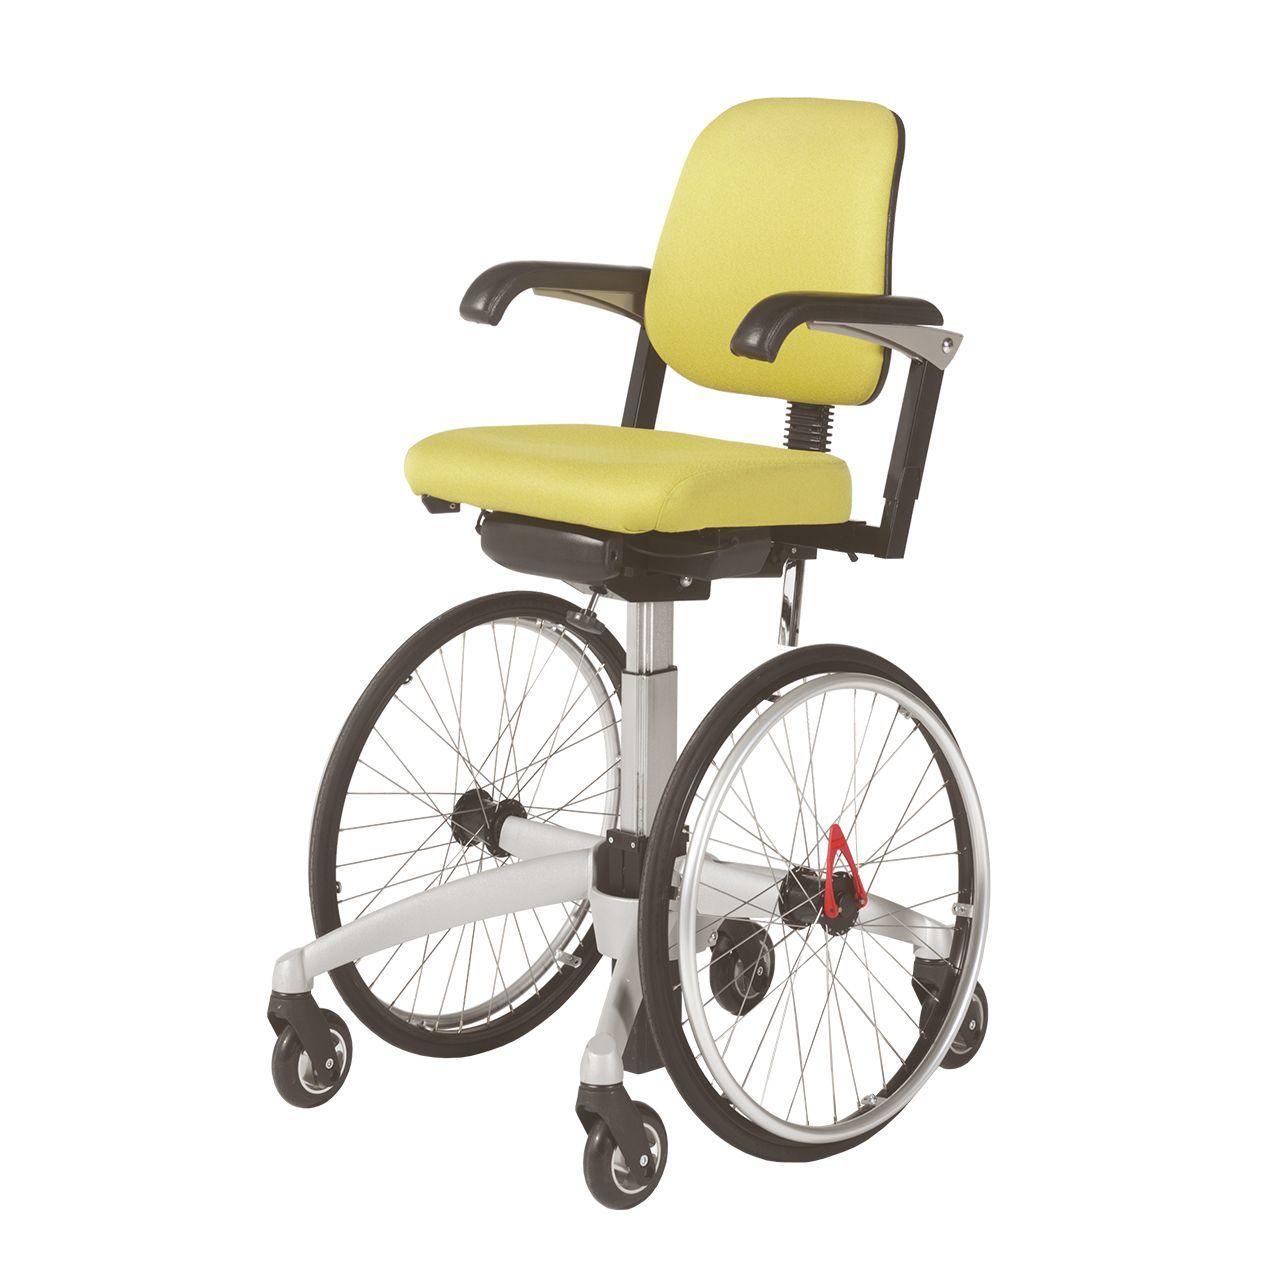 Le Tripple Wheels